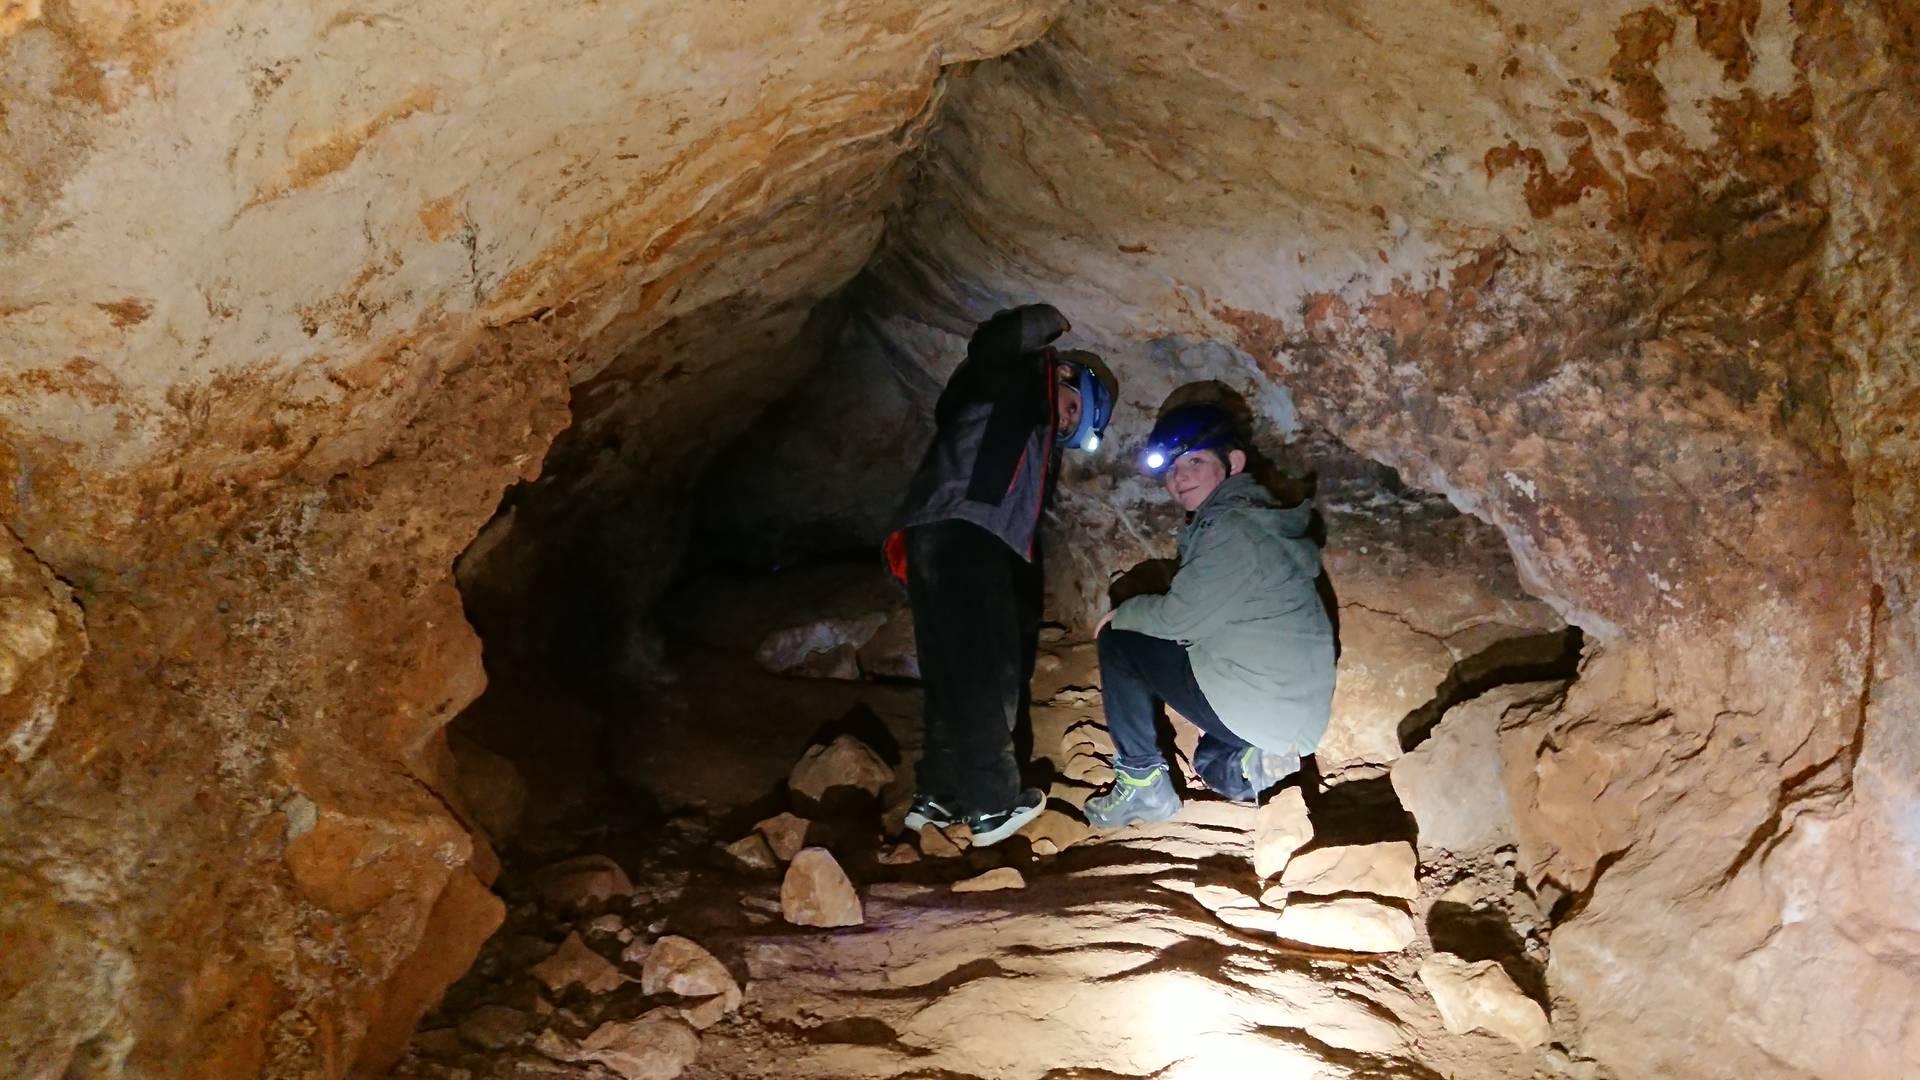 grotte-duhibou-millau10.jpg